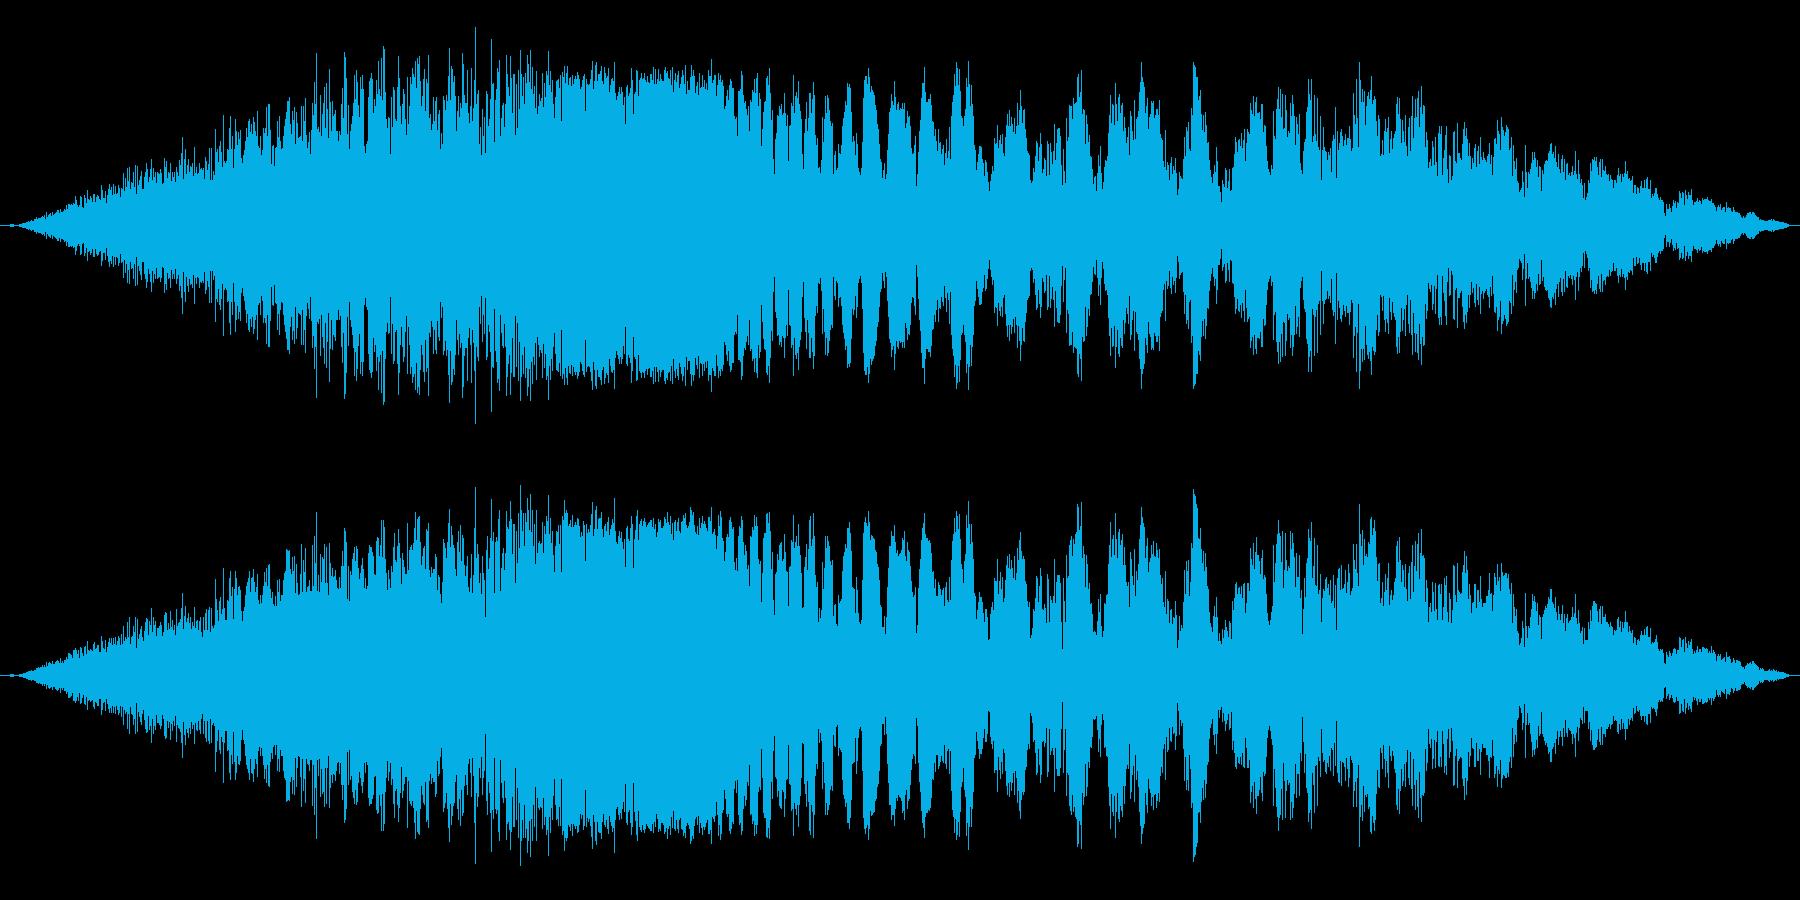 【F1】超ド迫力のF1エンジン効果音3!の再生済みの波形